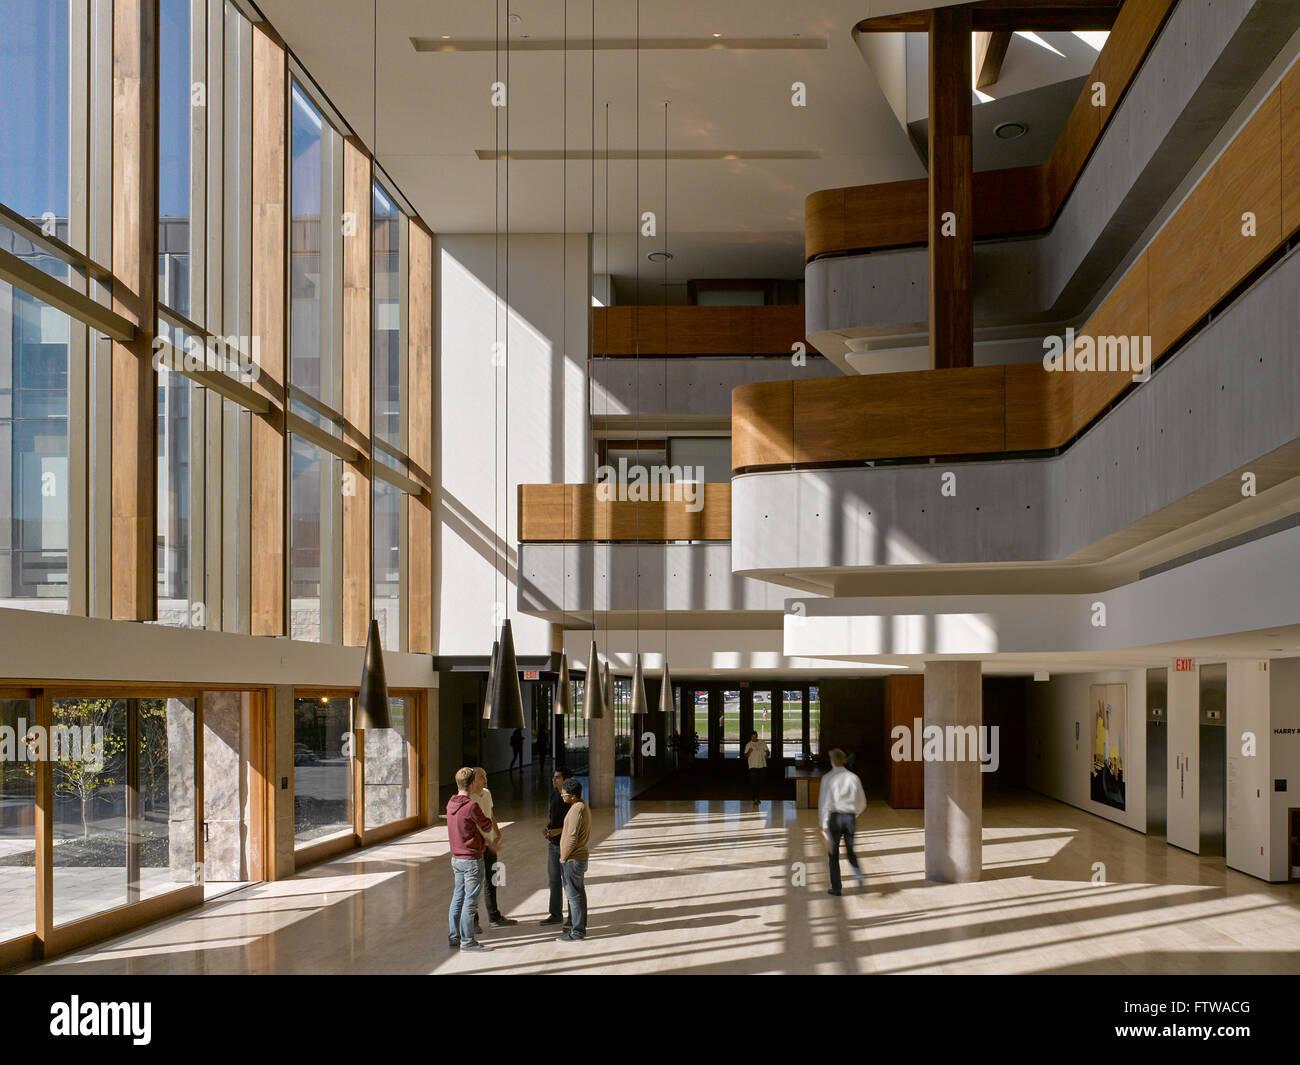 Great Hall Ivey Business School London Canada Architect Hariri Stock Photo 101360576 Alamy